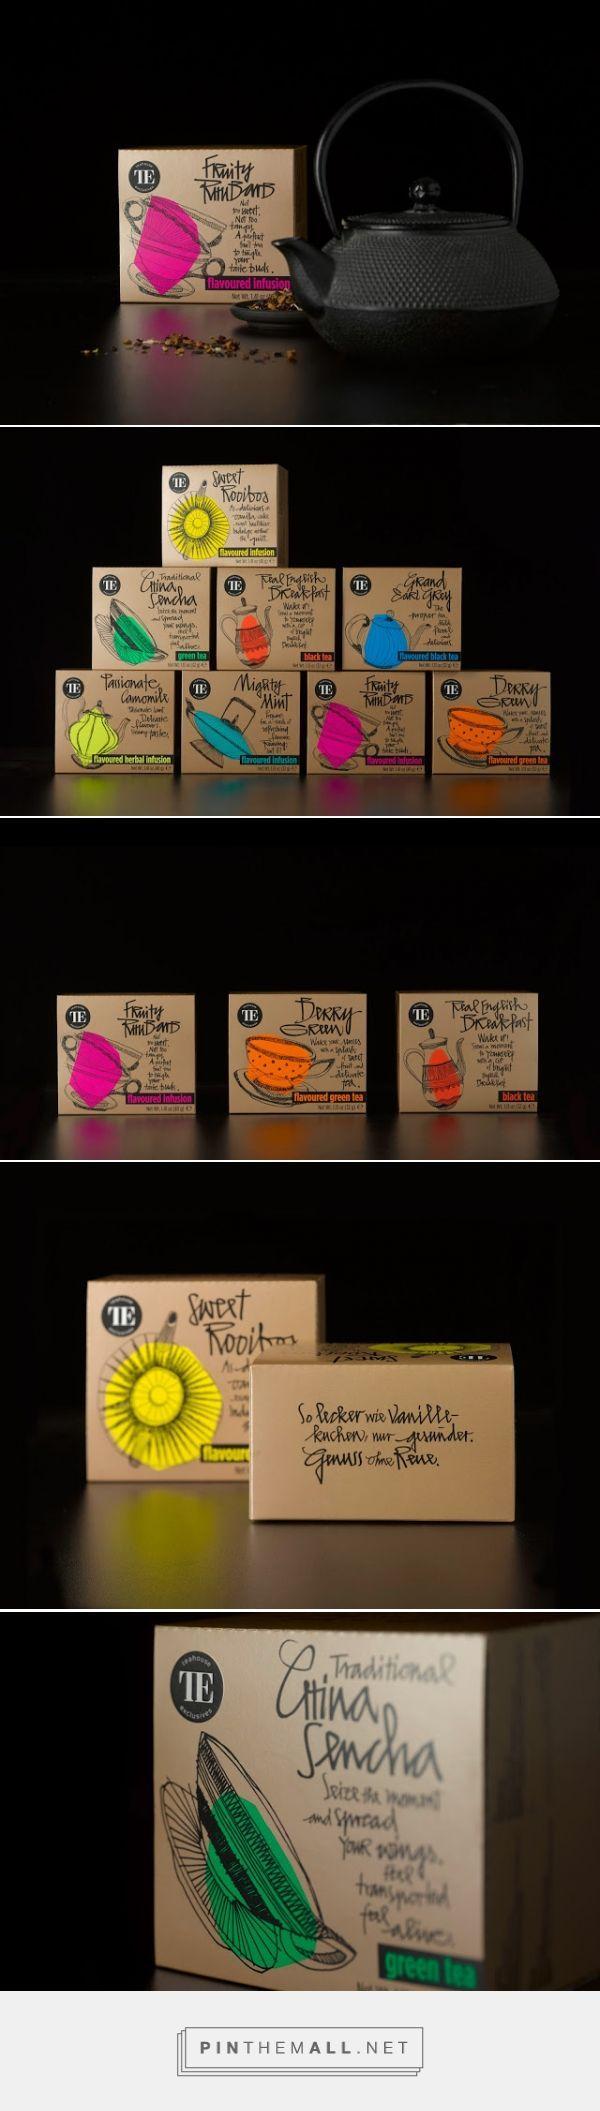 Packaging de cajas original: https://www.cajadecarton.es/contactar?utm_source=Pinterest&utm_medium=social&utm_campaign=20160617-cajadecarton_contactar